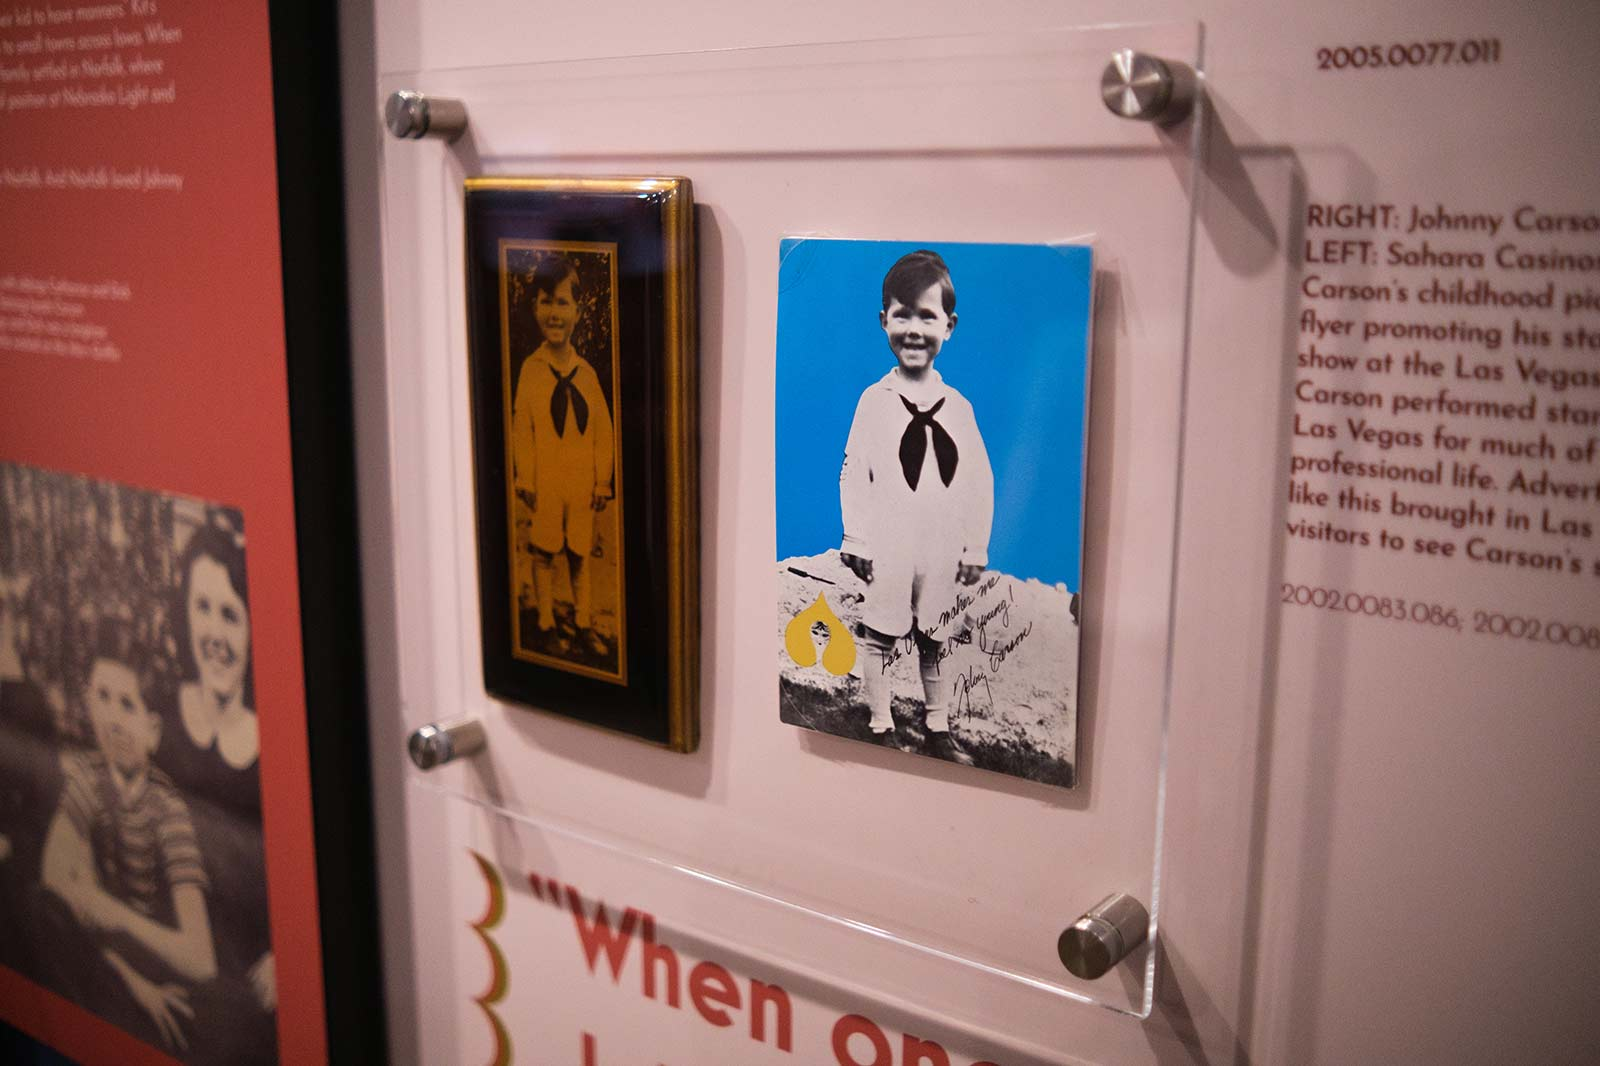 Johnny Carson Exhibit artifact mount